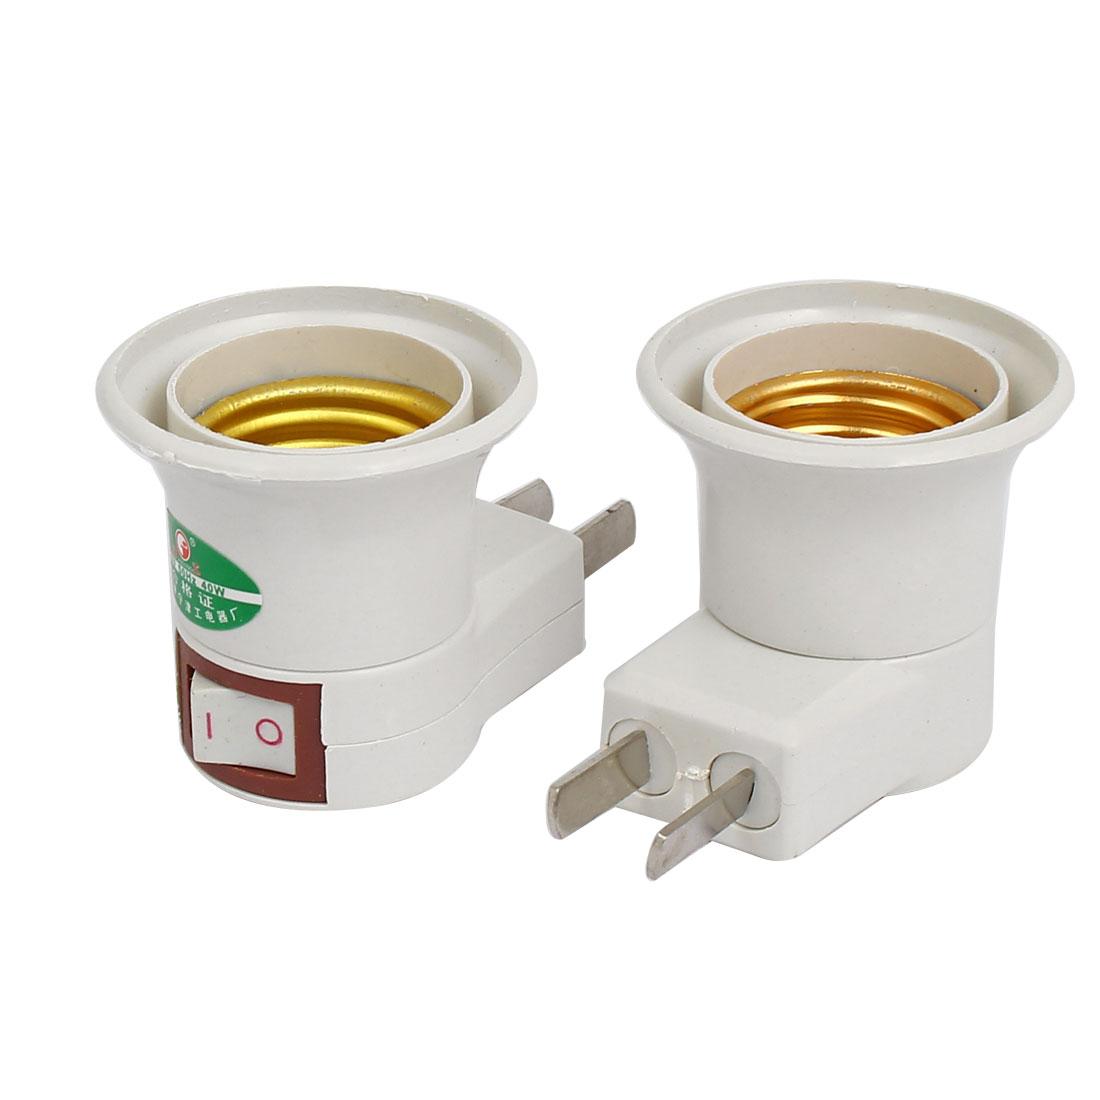 220V US Plug to E27 Base Light Bulb Lamp Socket Holder Adapter Converter 2pcs